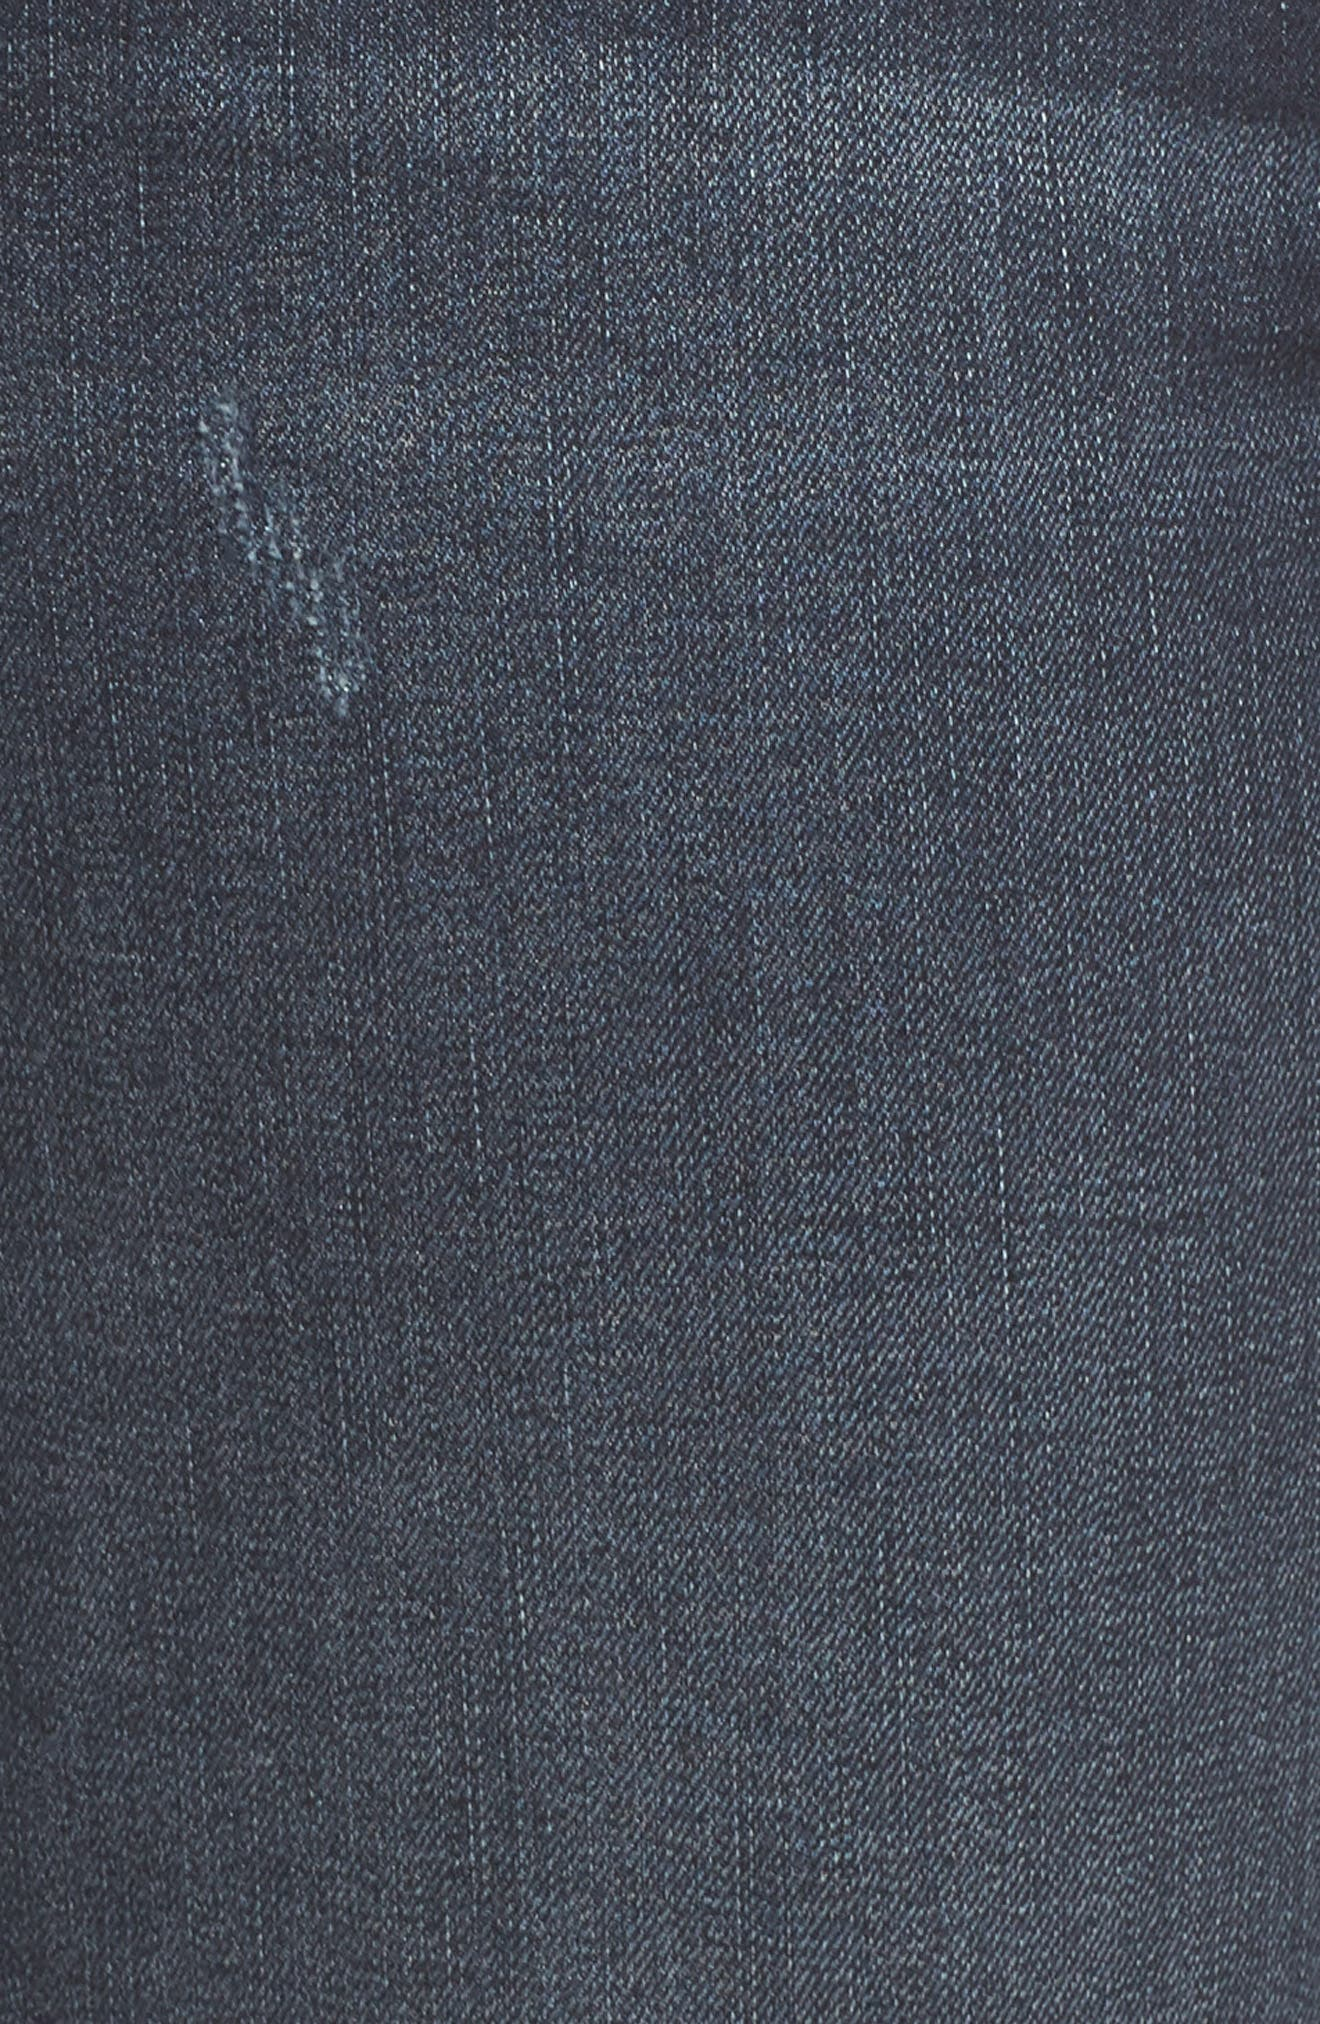 SLINK JEANS, Stretch Ankle Boyfriend Jeans, Alternate thumbnail 6, color, BELLA